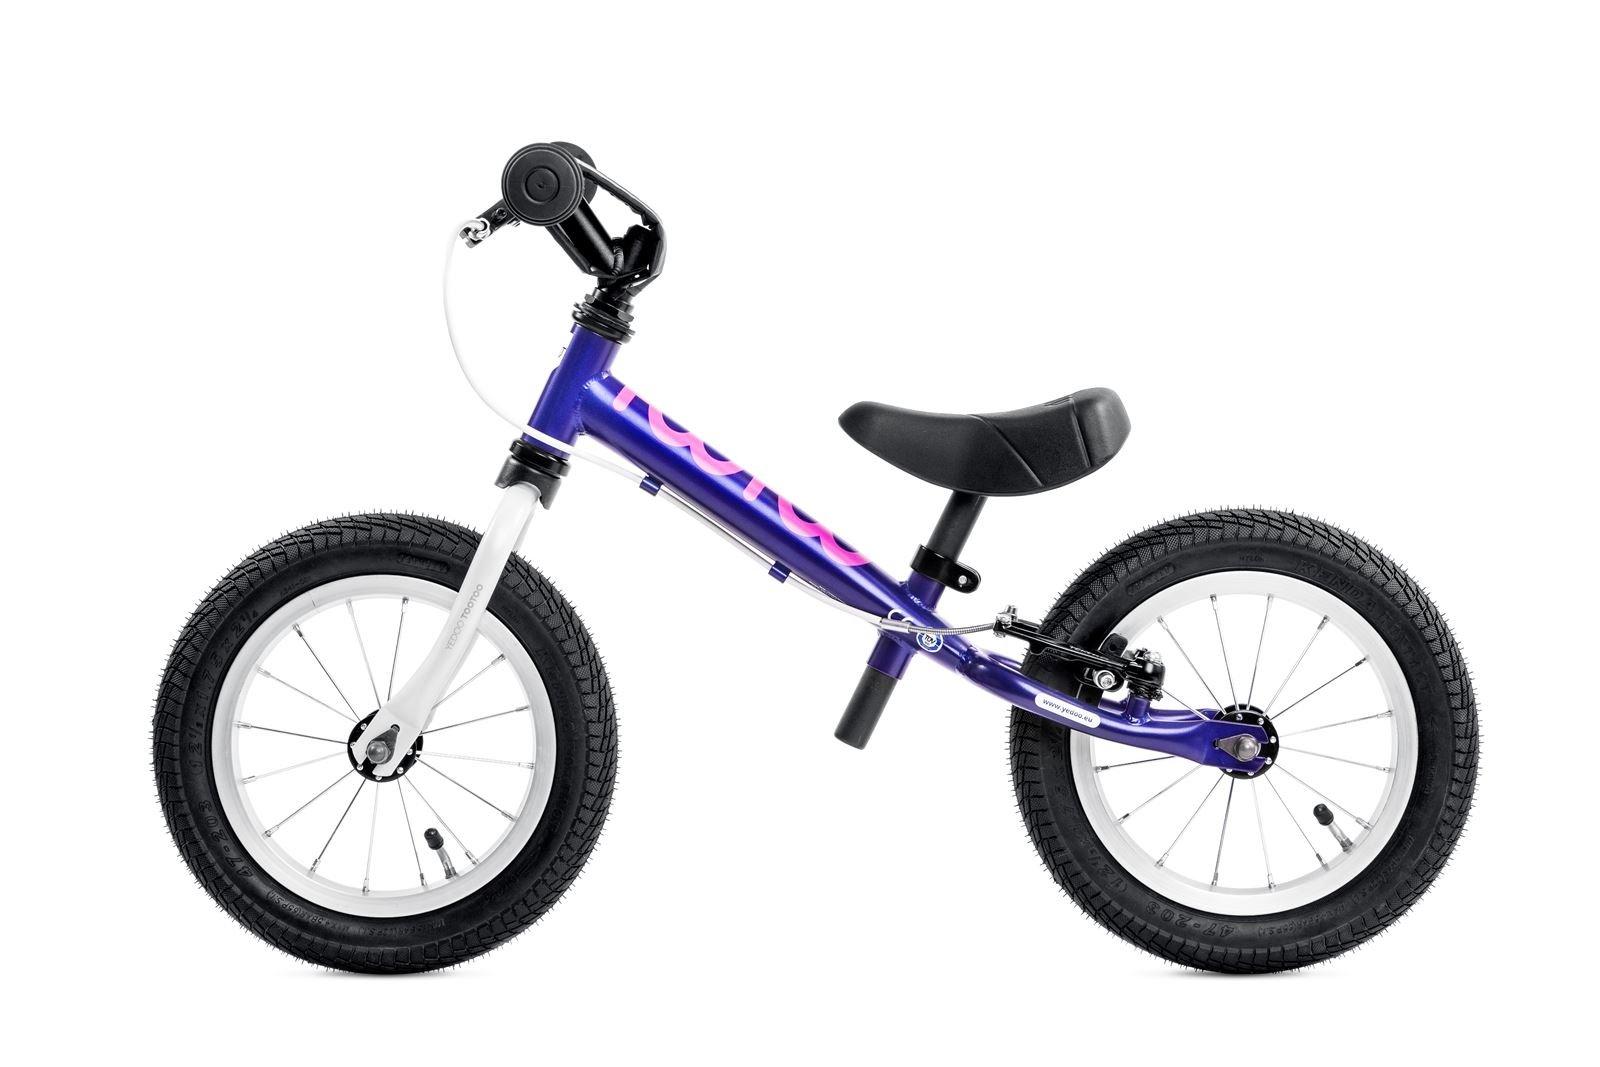 TooToo 12'' Balance Bike by Yedoo Age 2-5 (Violet)